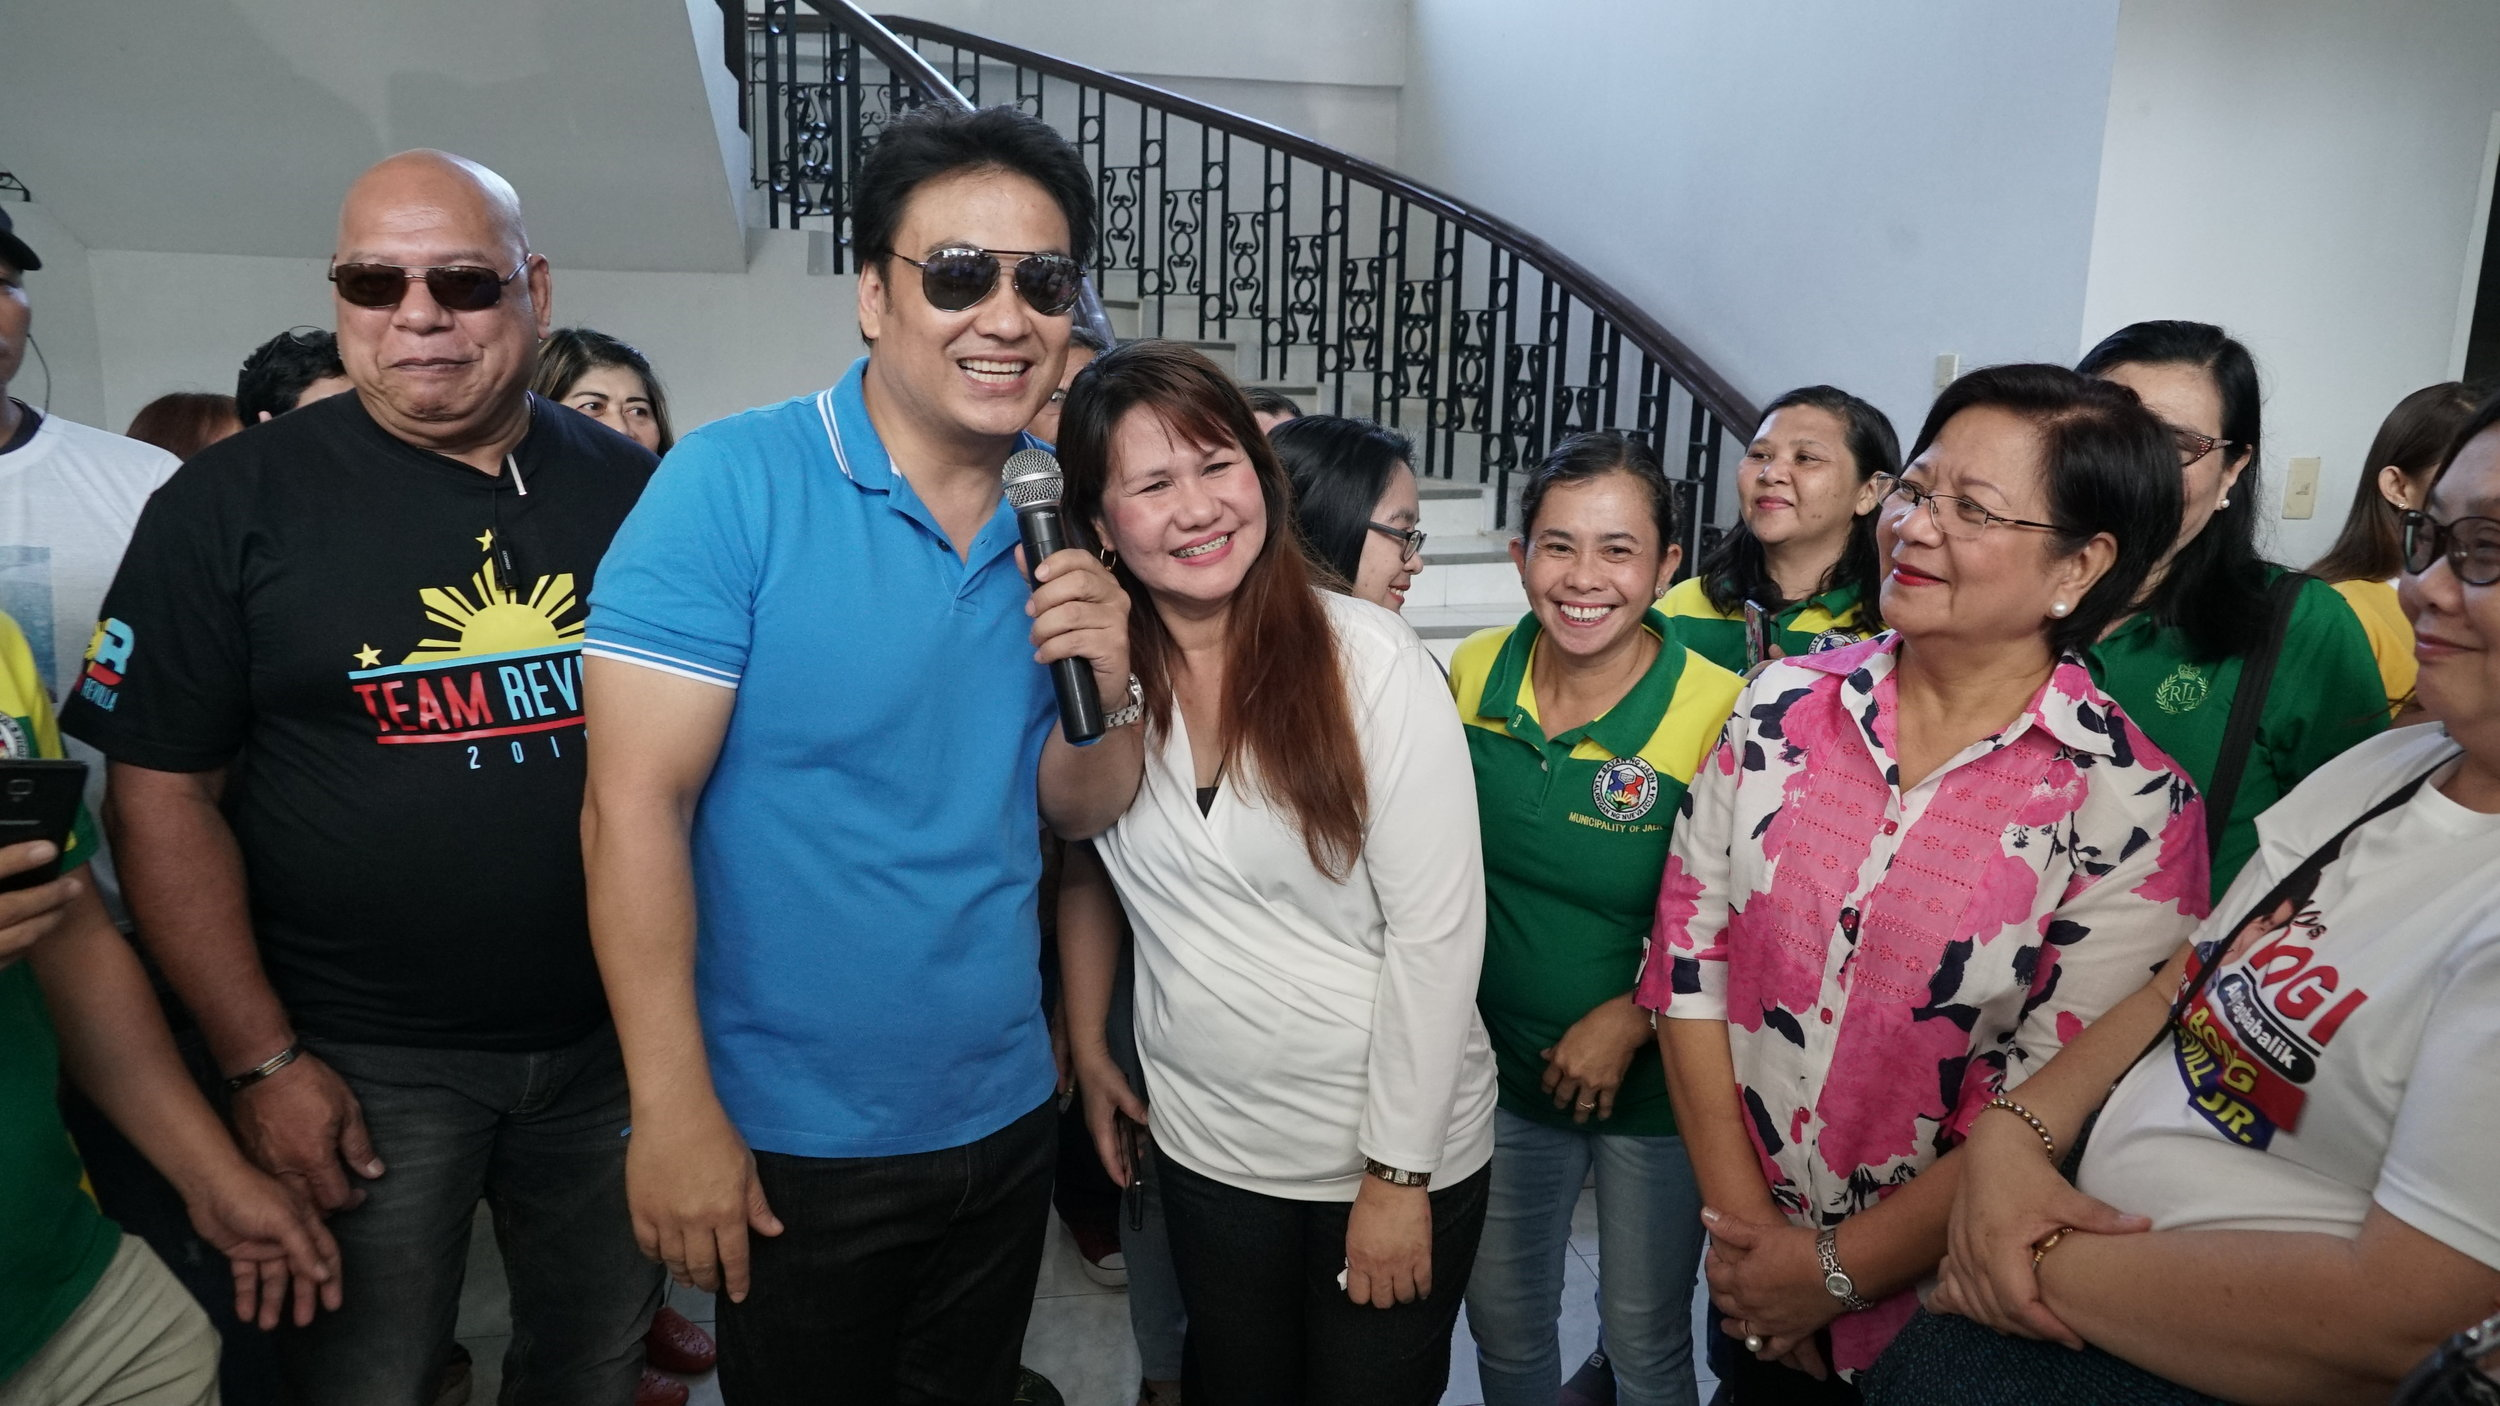 Jaen, Nueva Ecija - January 16, 2019